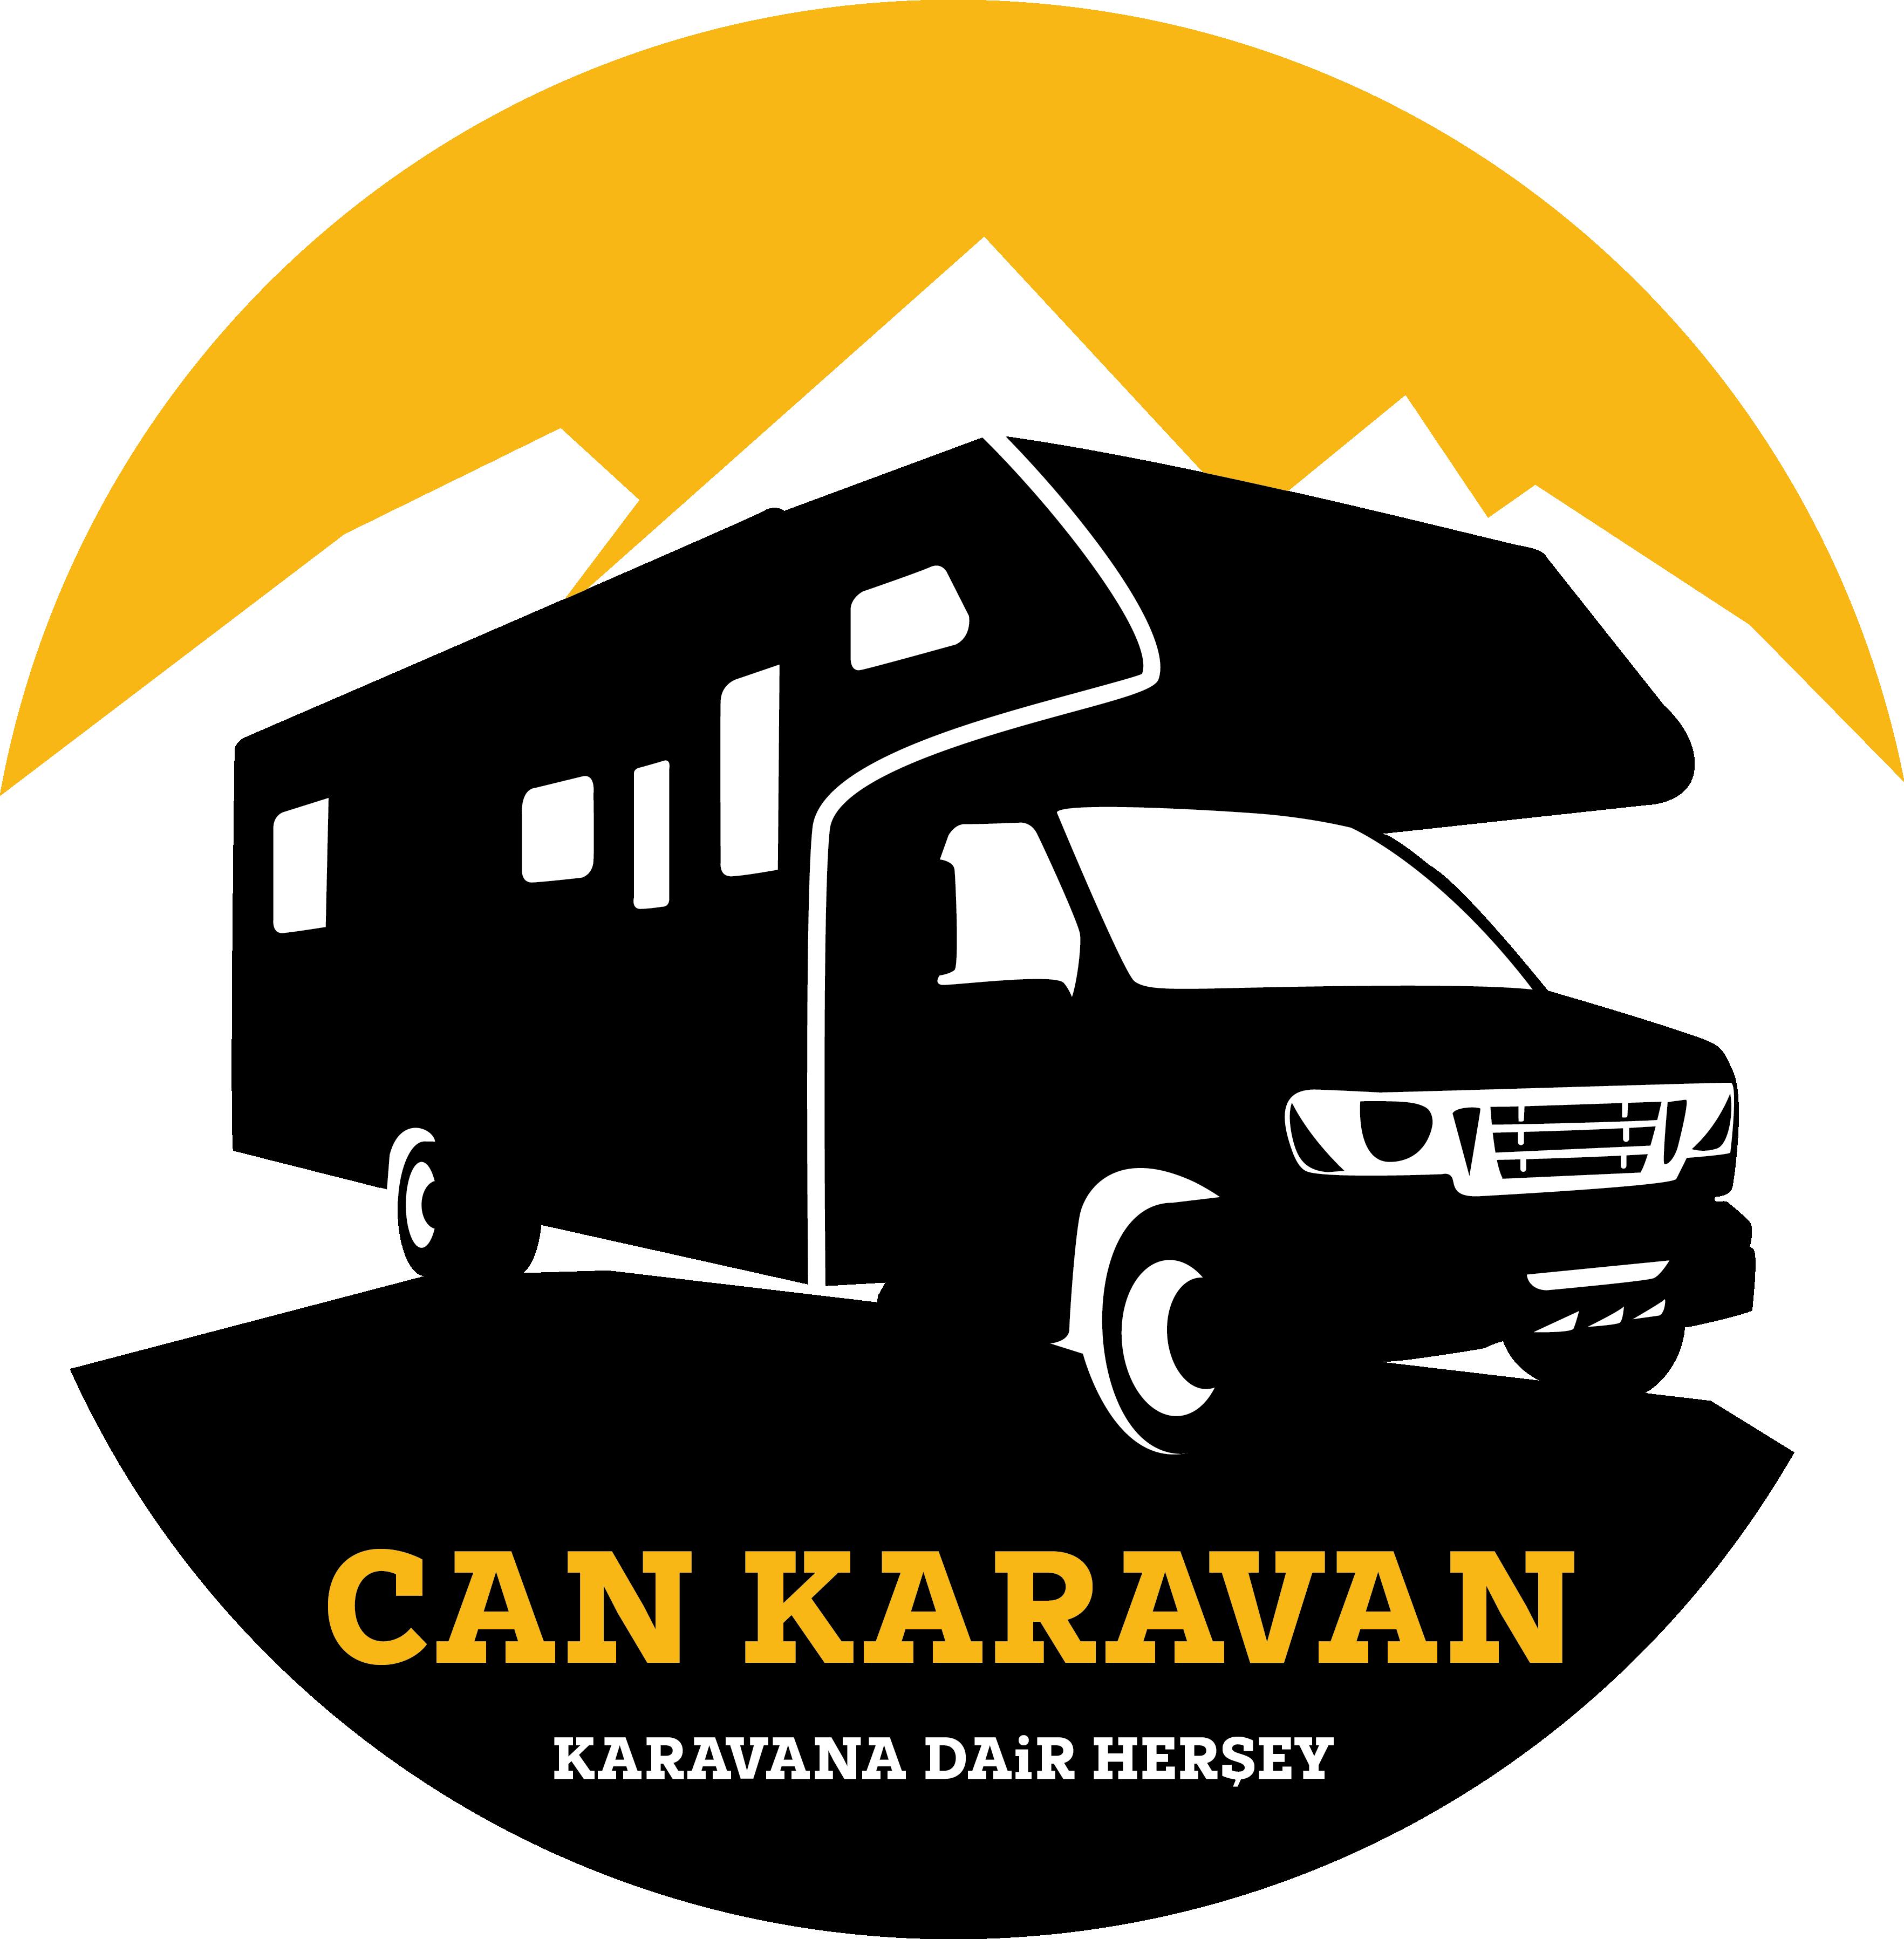 CAN KARAVAN